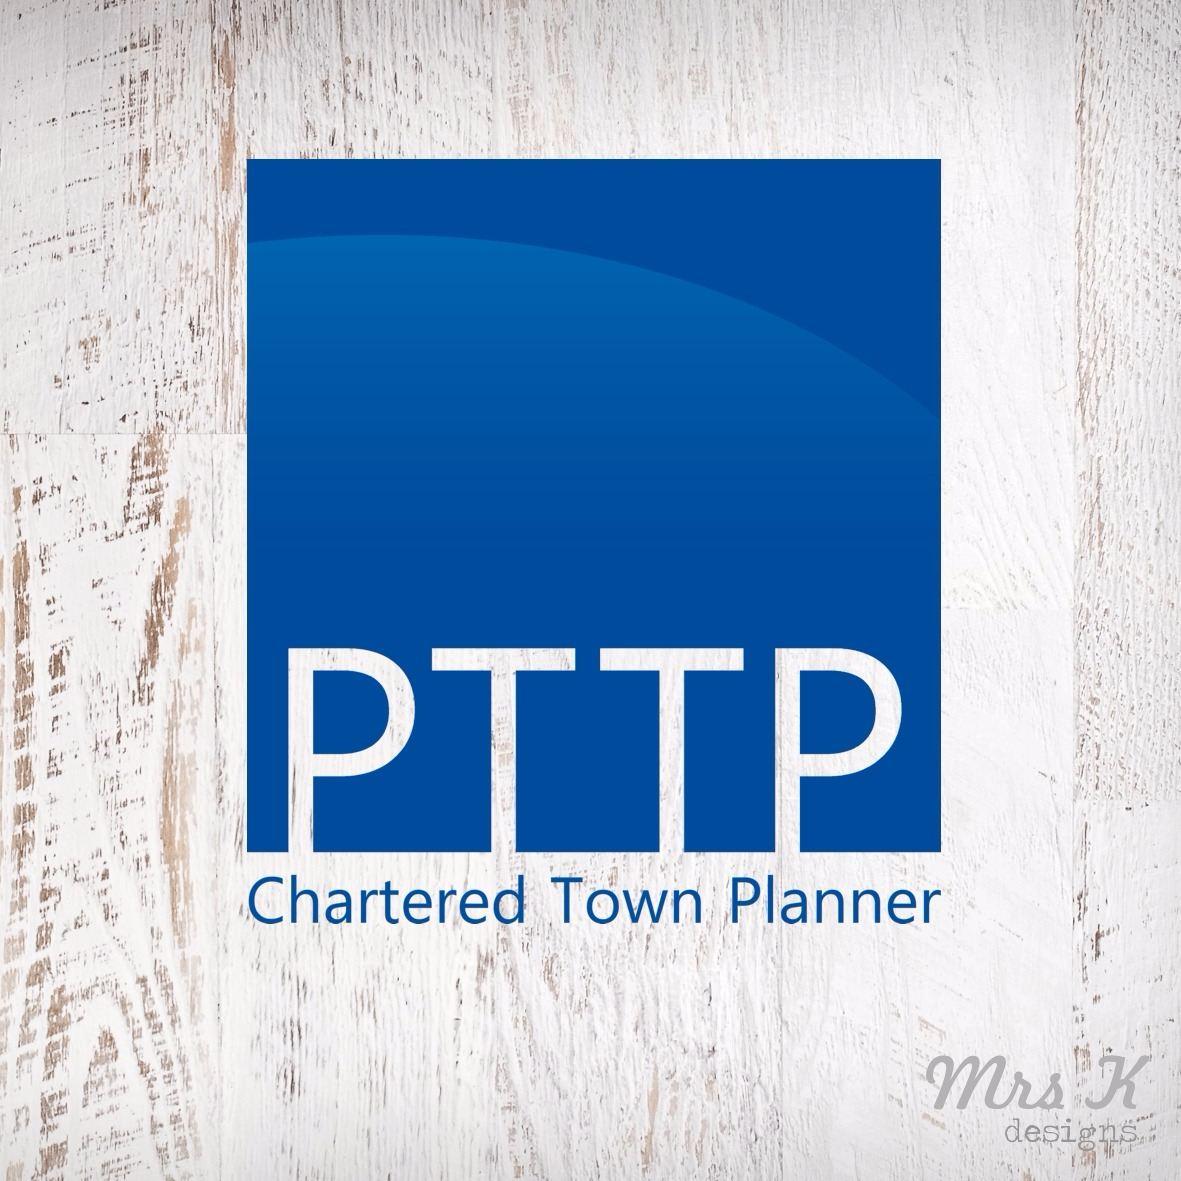 logos - pttp